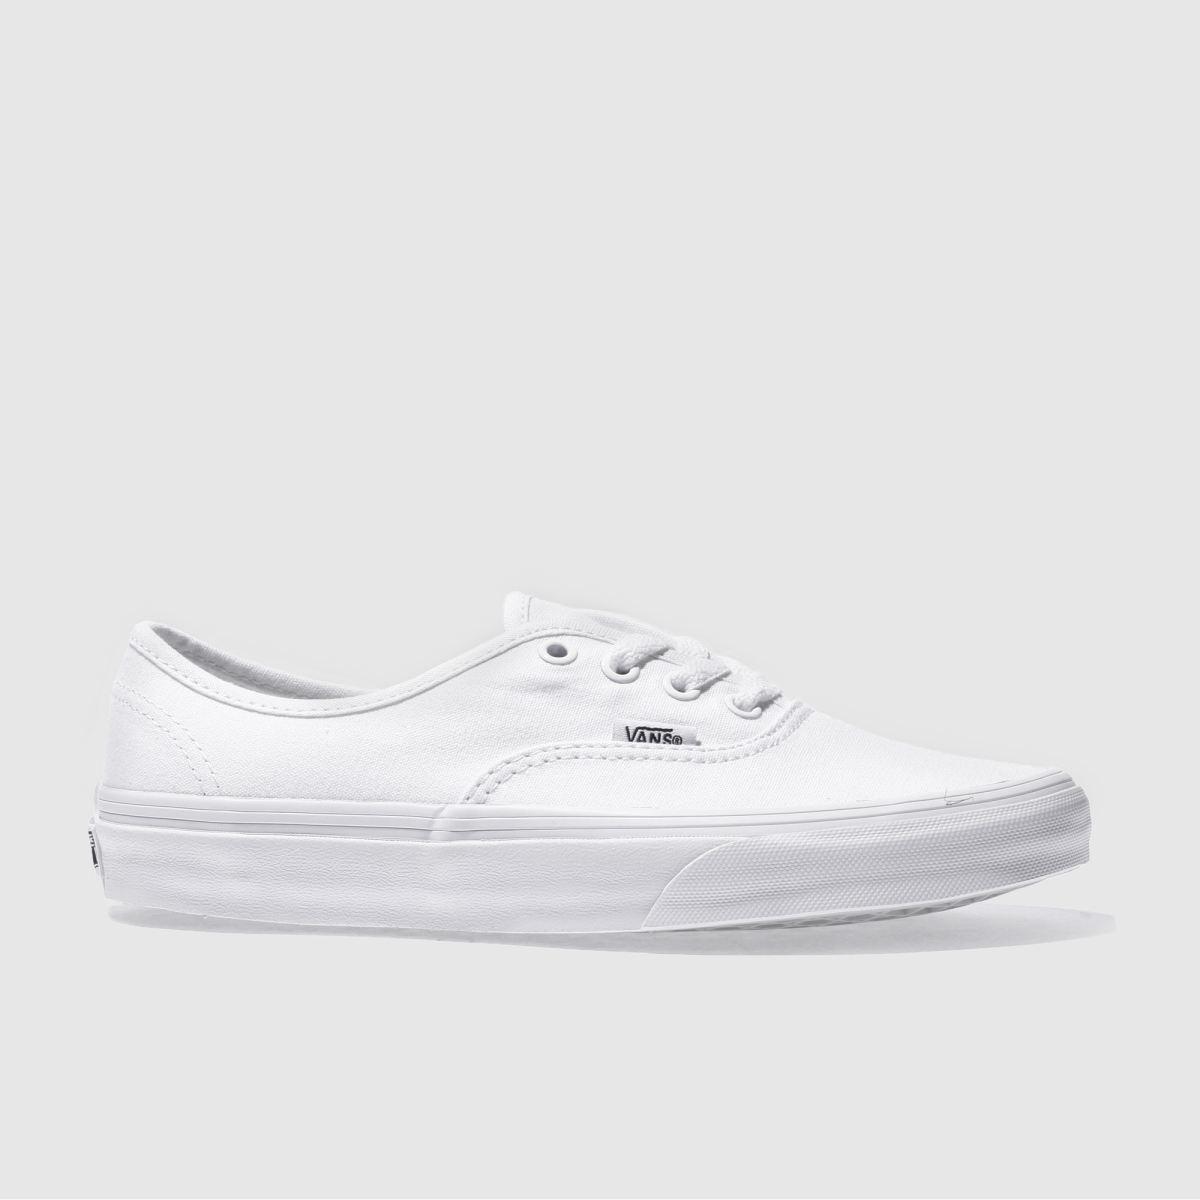 Vans White Authentic Trainers